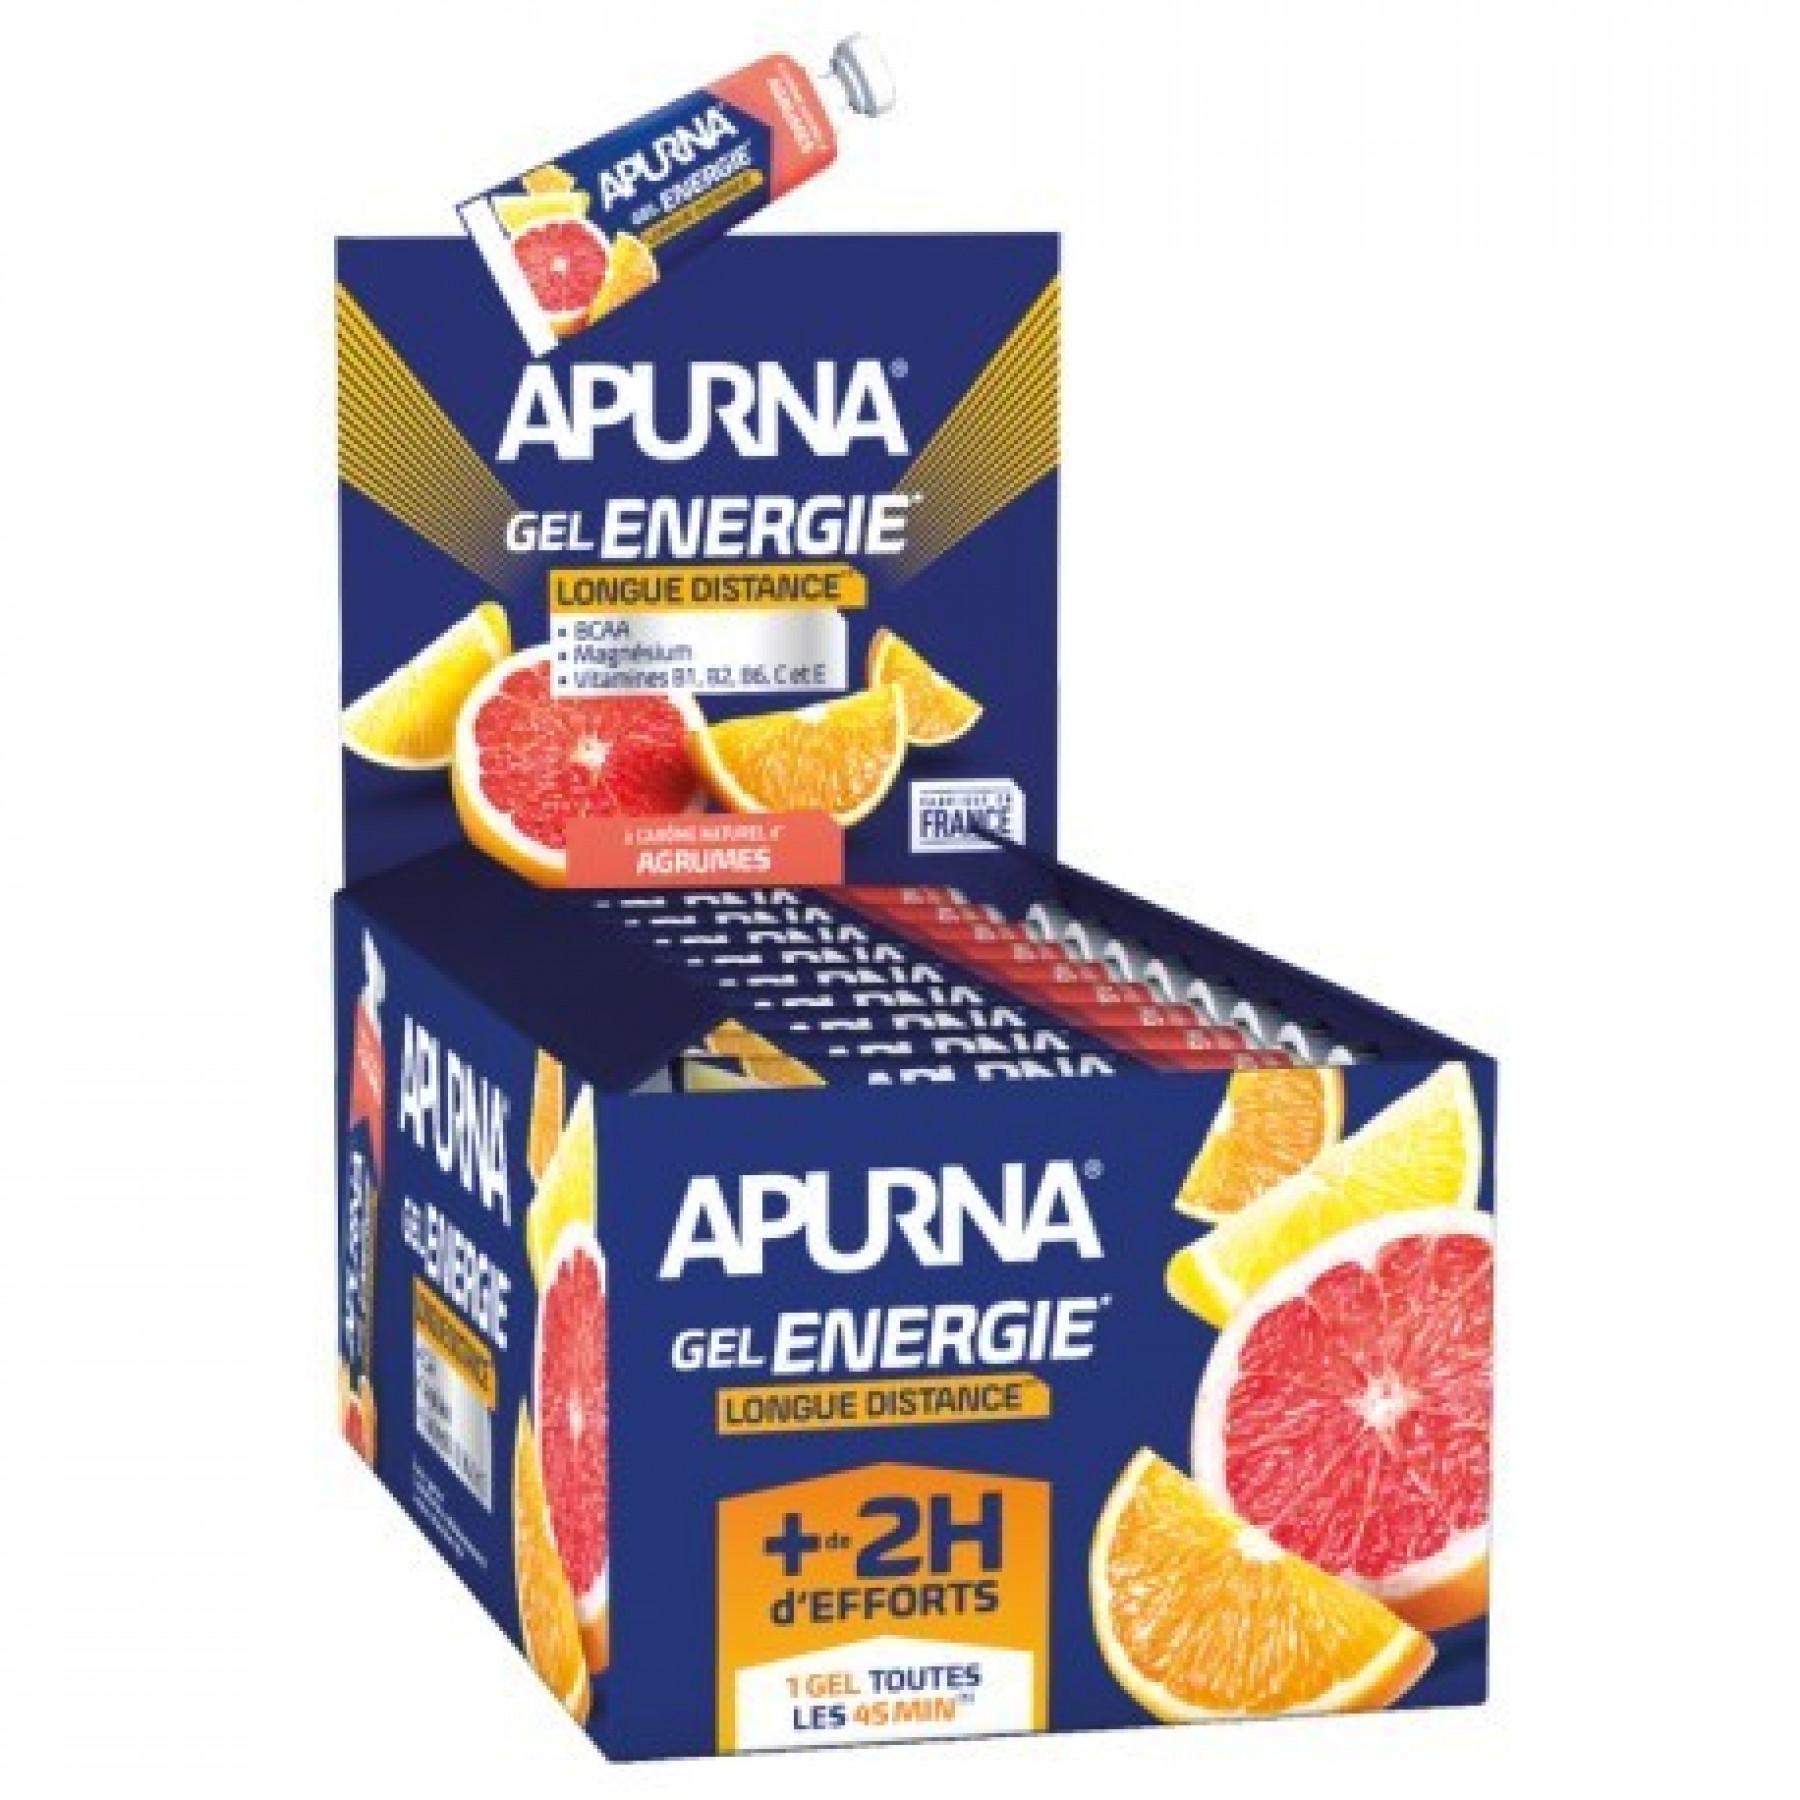 Batch of 25 gels Apurna Energie longue distance agrumes - 35g